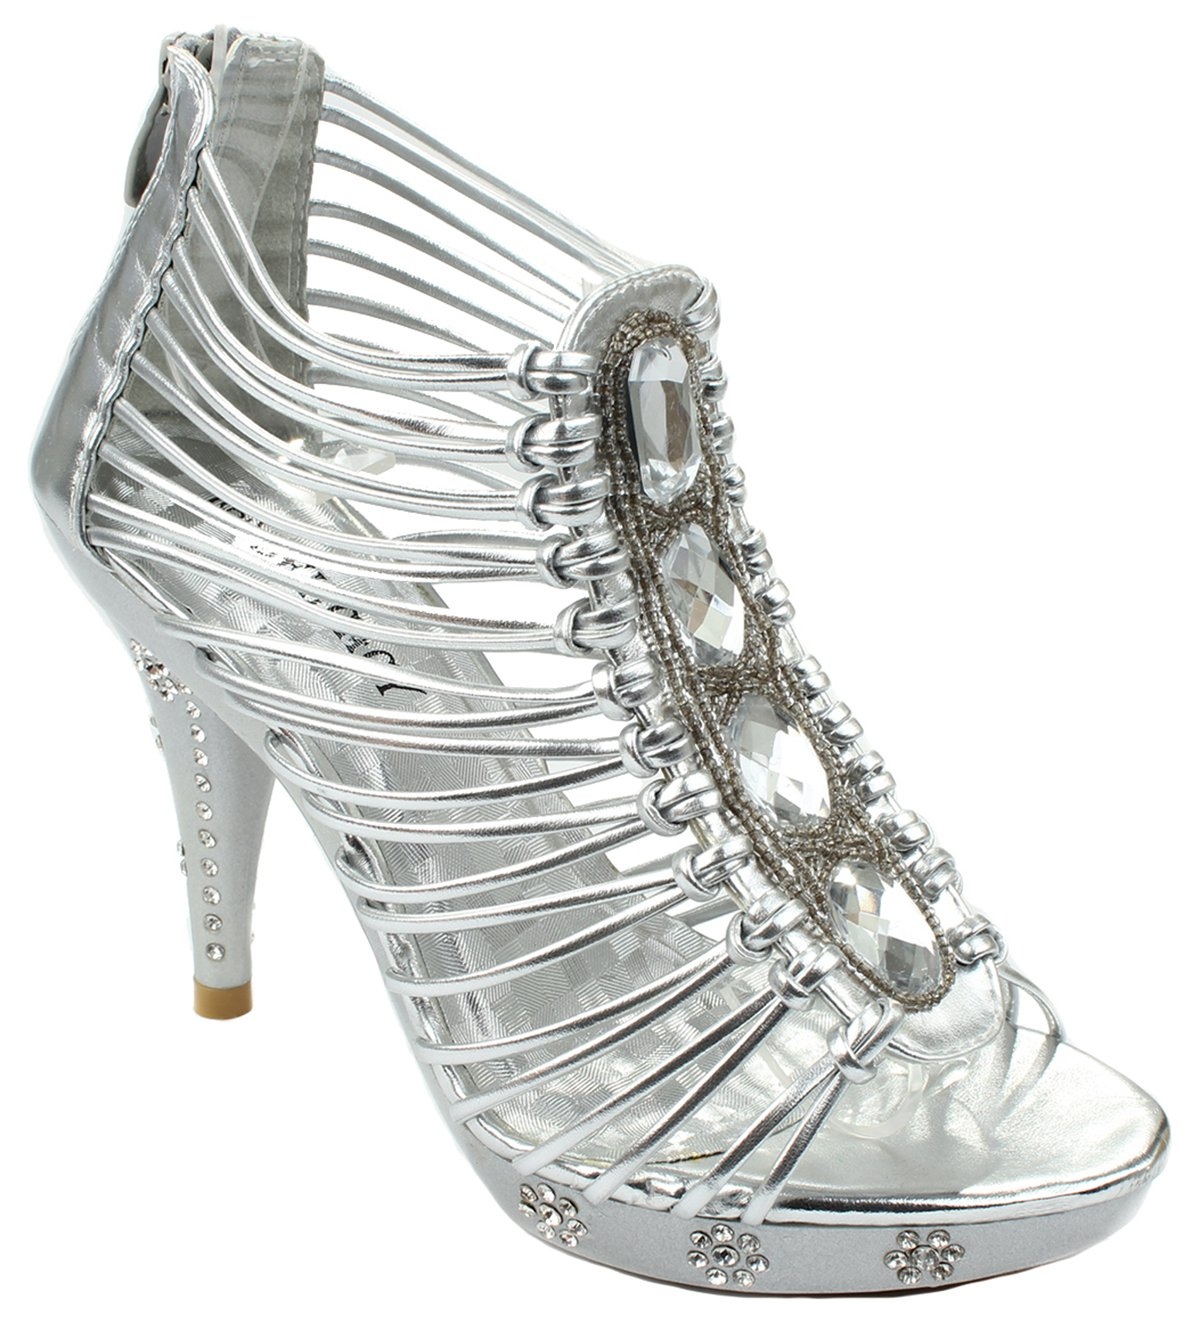 Women Strap Sparkle Rhinestone Strappy Zipper Open Toe Party Evening Dress Heels Sandal Pumps B074HFZ51R 8.5 B(M) US|Silver_t58